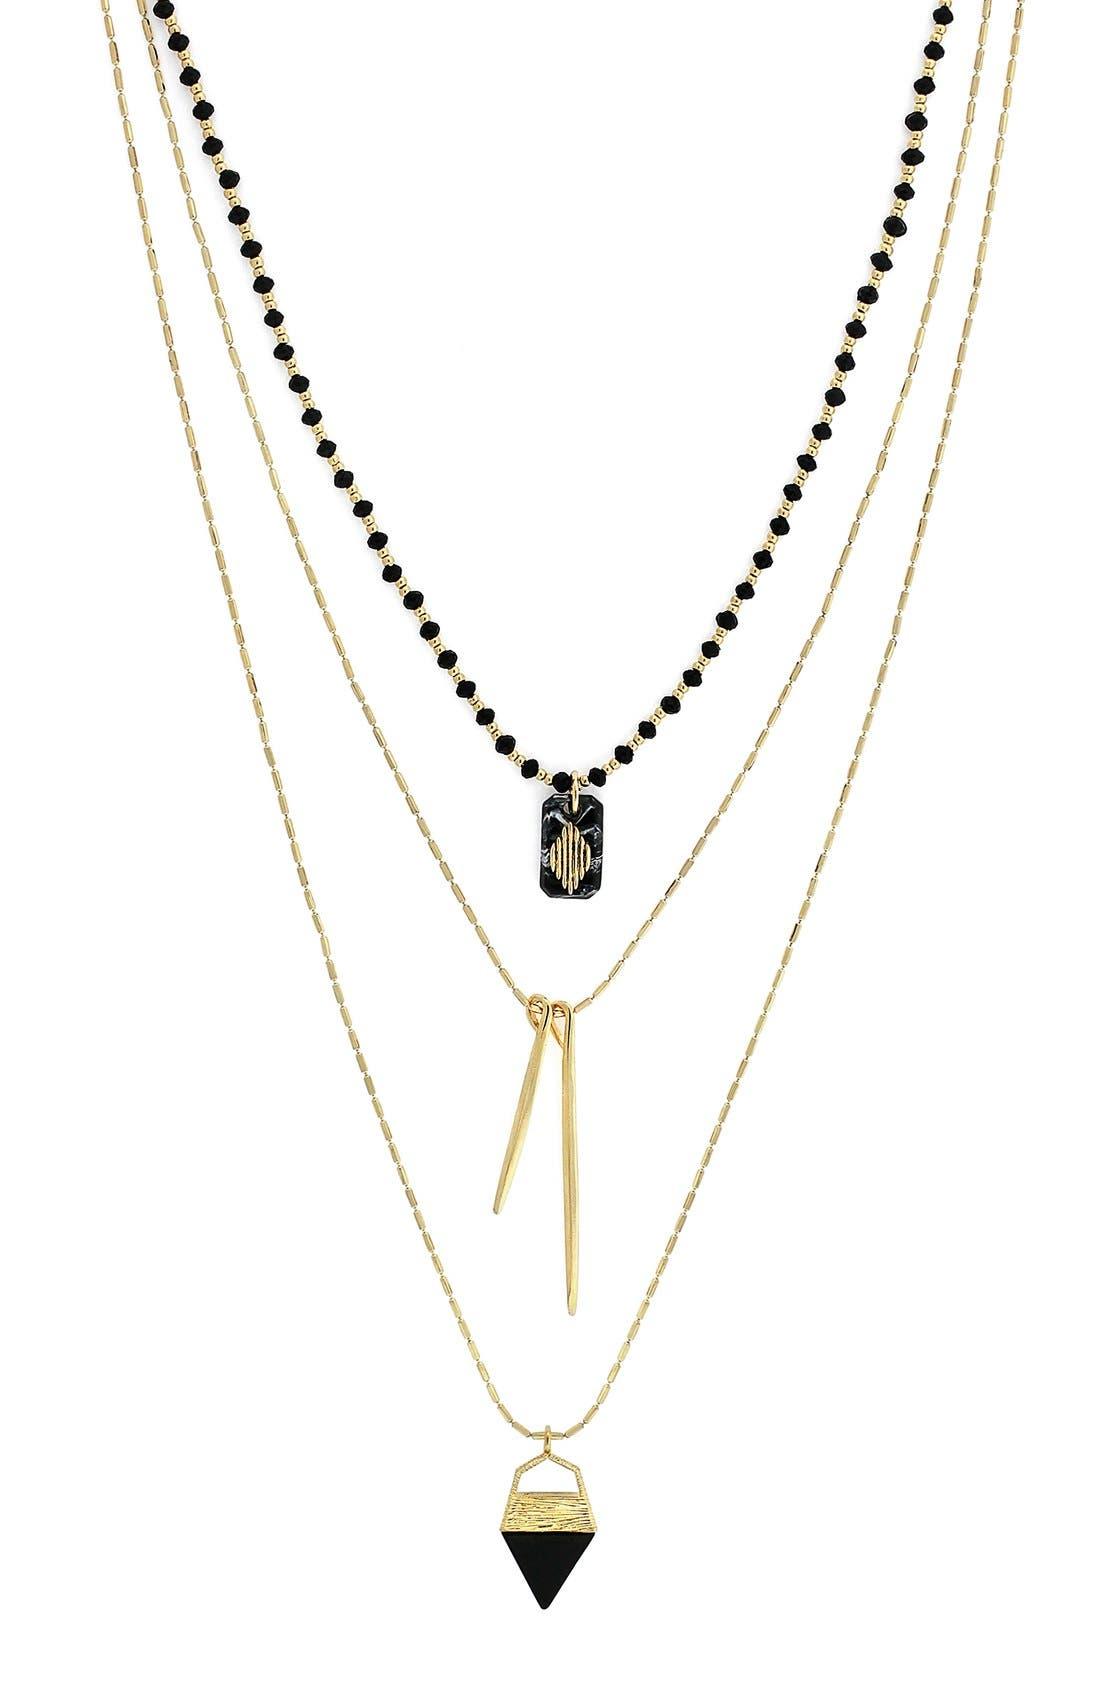 Alternate Image 1 Selected - Vince Camuto 'Serengeti Breeze' Triple Strand Necklace